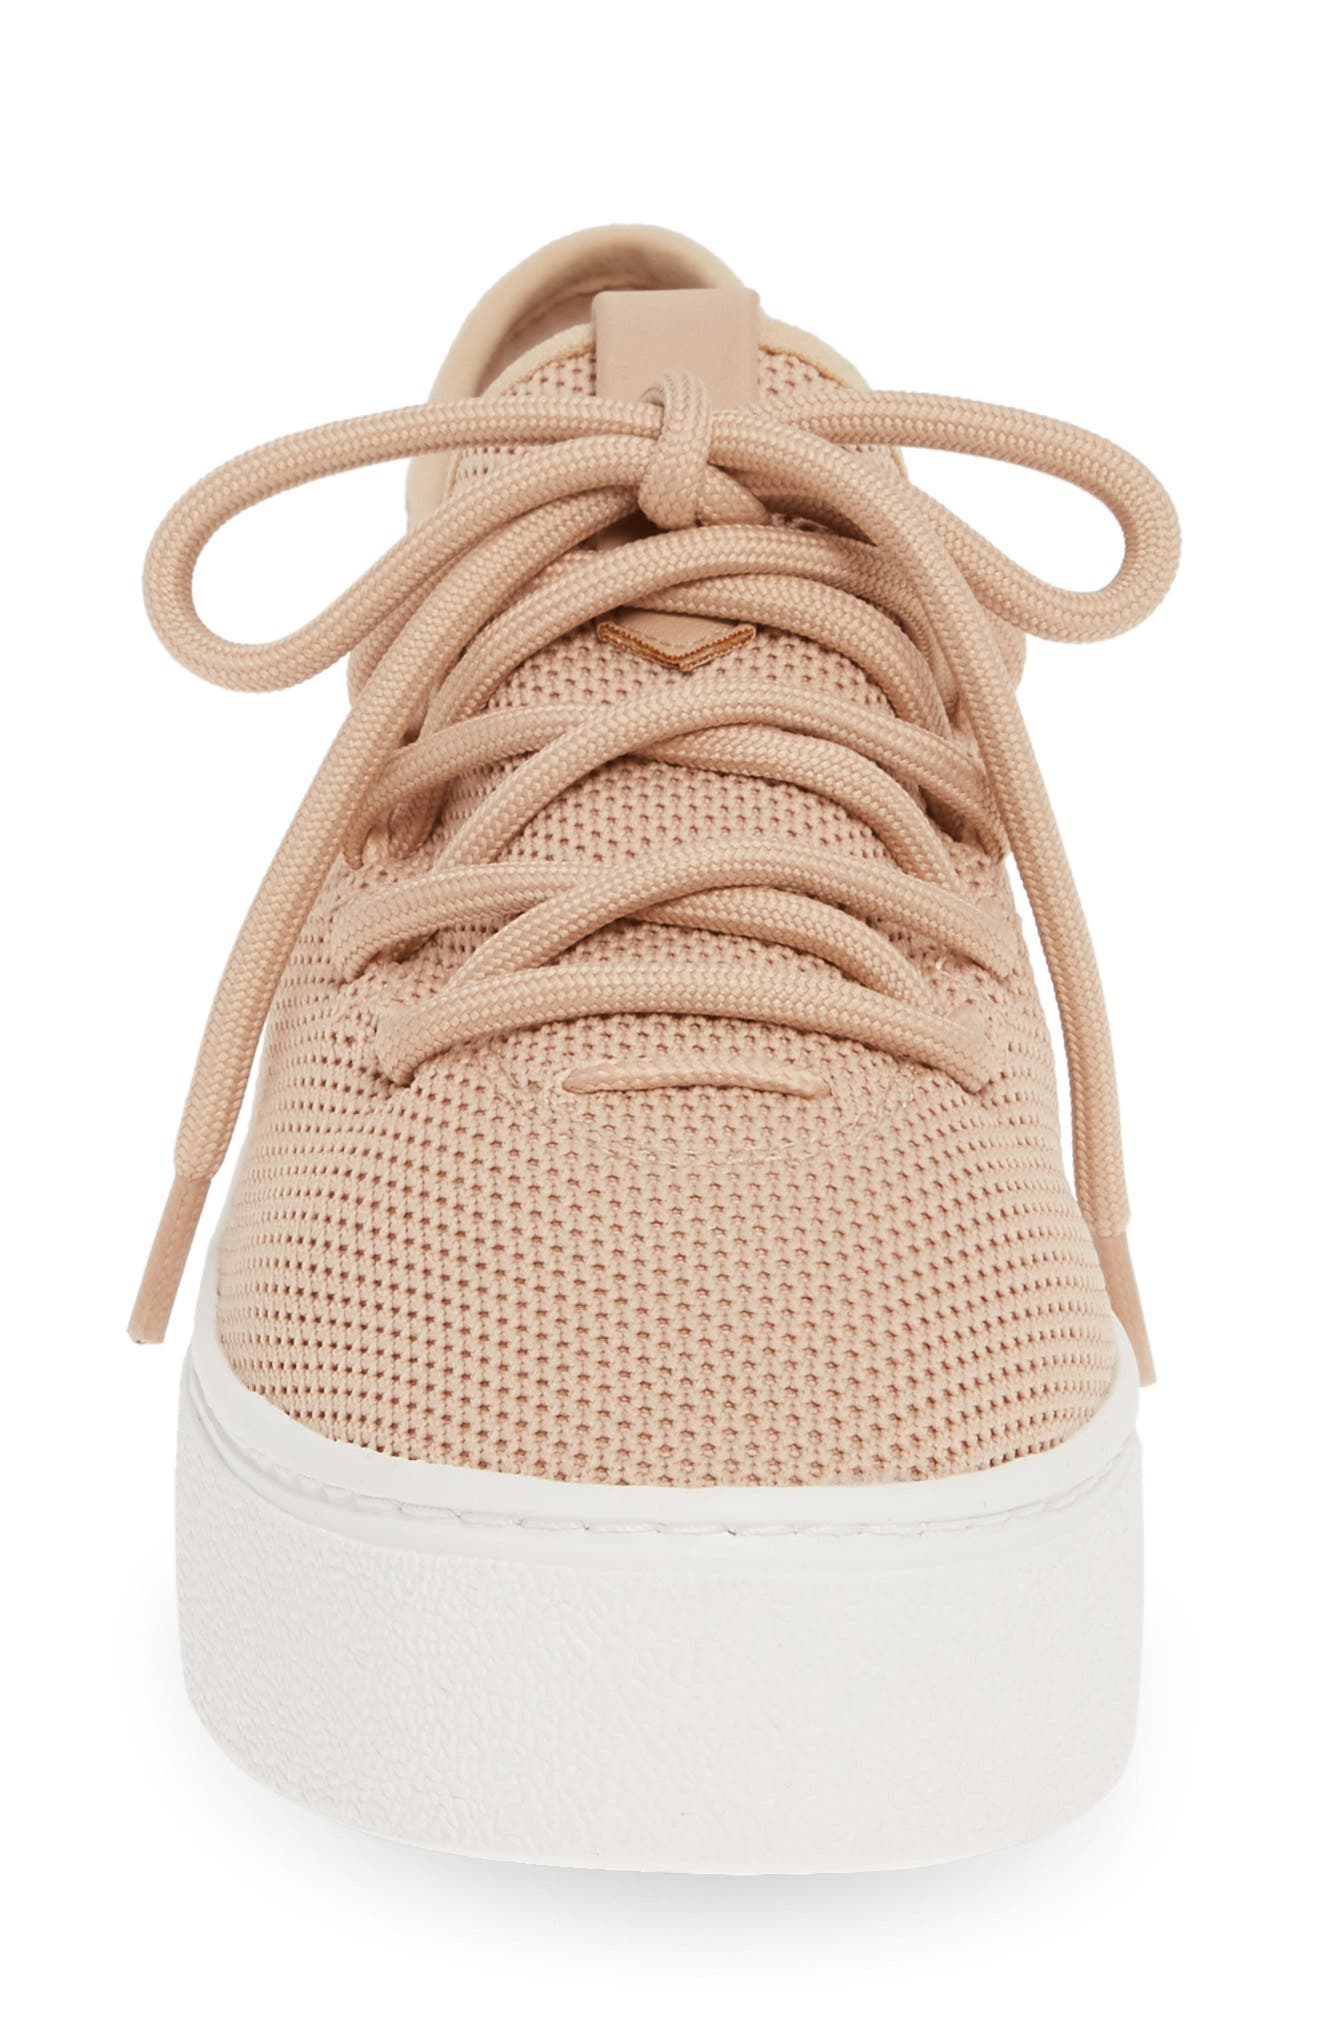 BP., BP Lace-Up Sneaker, Alternate thumbnail 4, color, BLUSH FABRIC